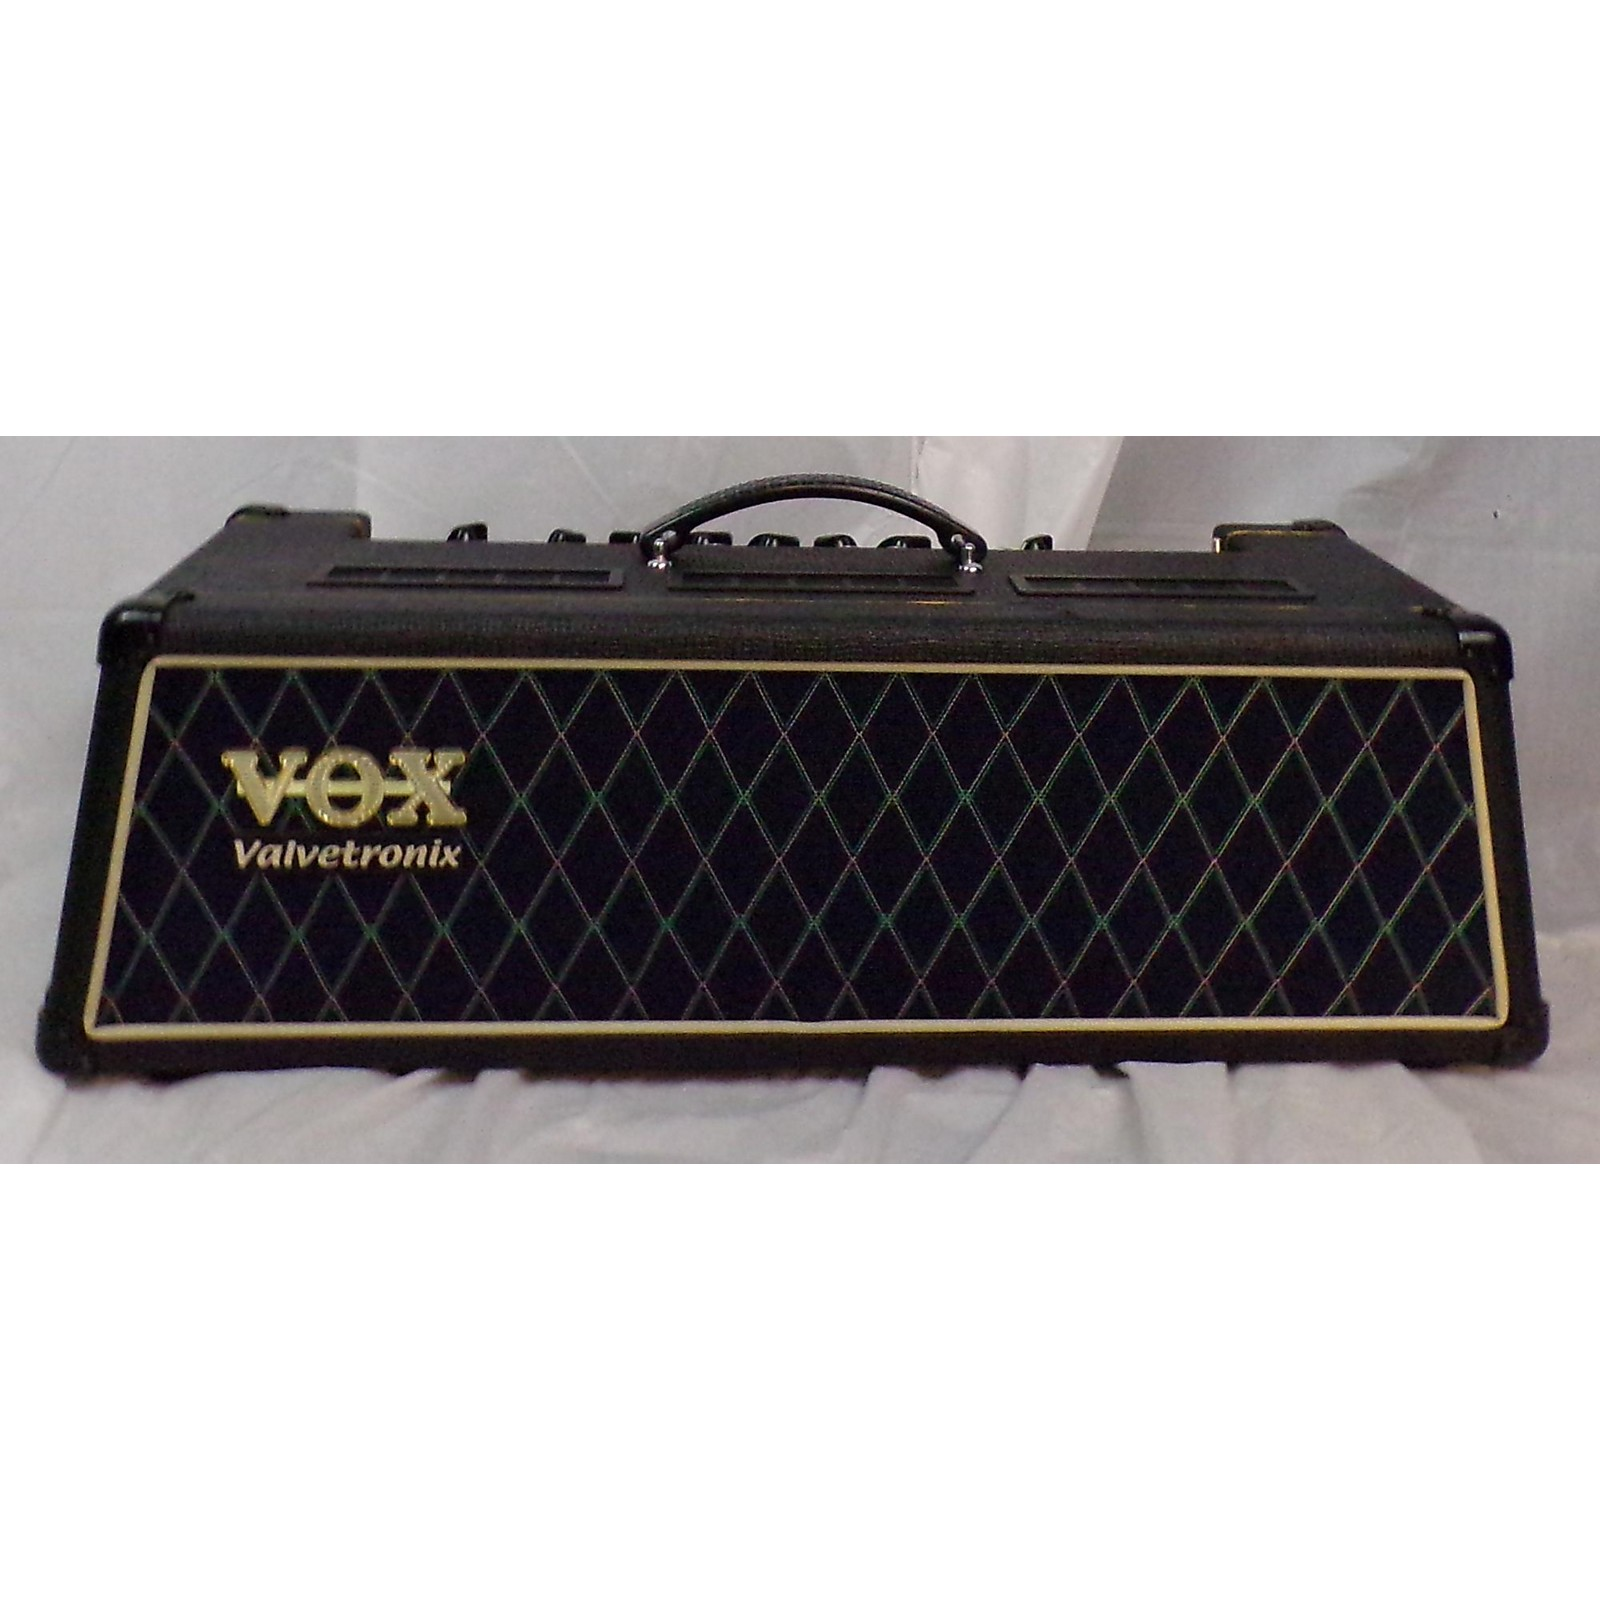 Vox AD120VTH 120W Valvetronix Solid State Guitar Amp Head